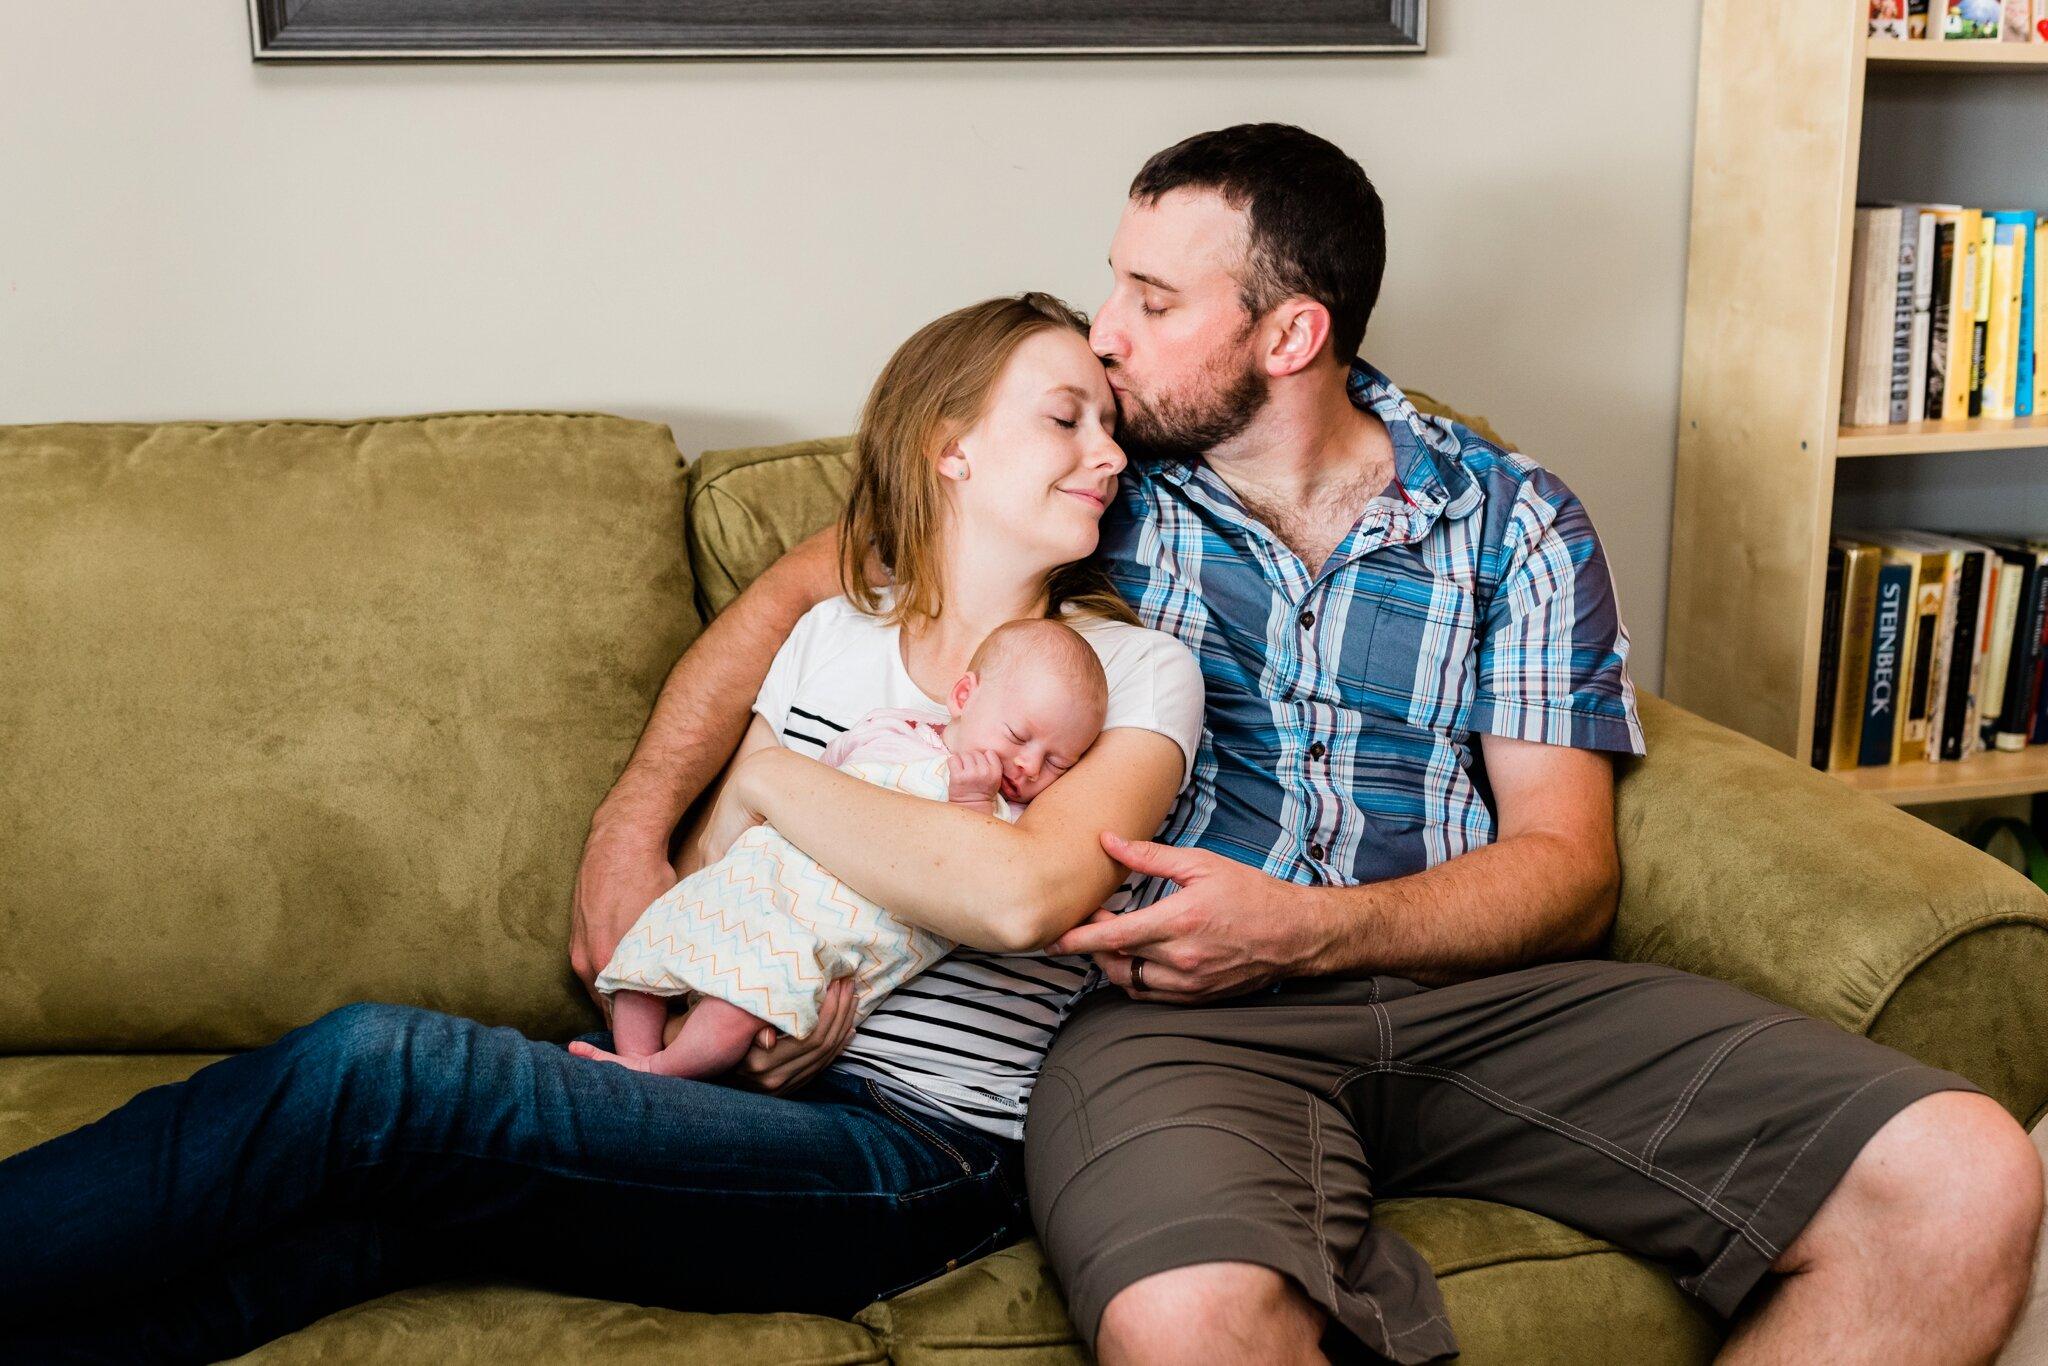 Lancaster PA Family Photographer, Lancaster PA Newborn Photographer, Harrisburg PA Family Photographer, Harrisburg PA Newborn Photographer, Elizabethtown PA Family Photographer